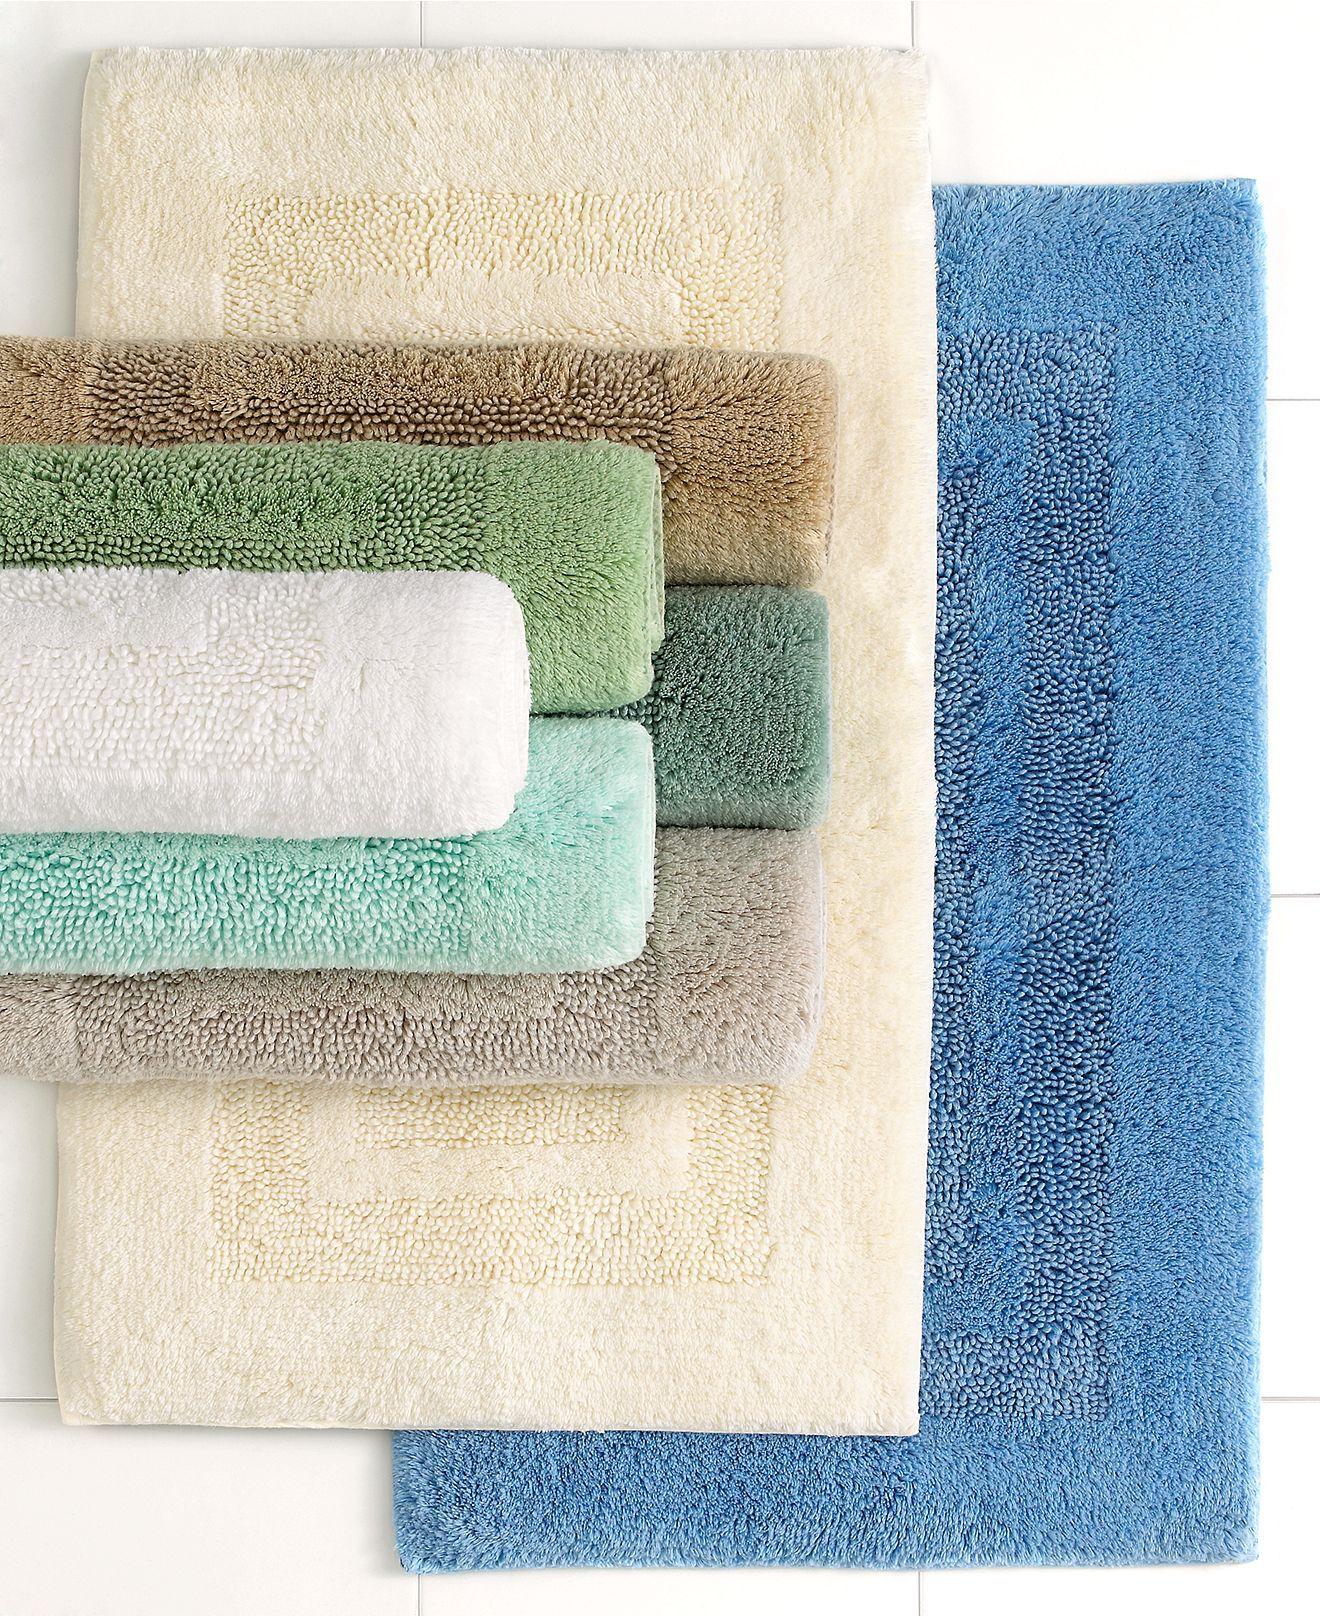 Martha Stewart Collection Bath Rugs Plush Squares Cotton